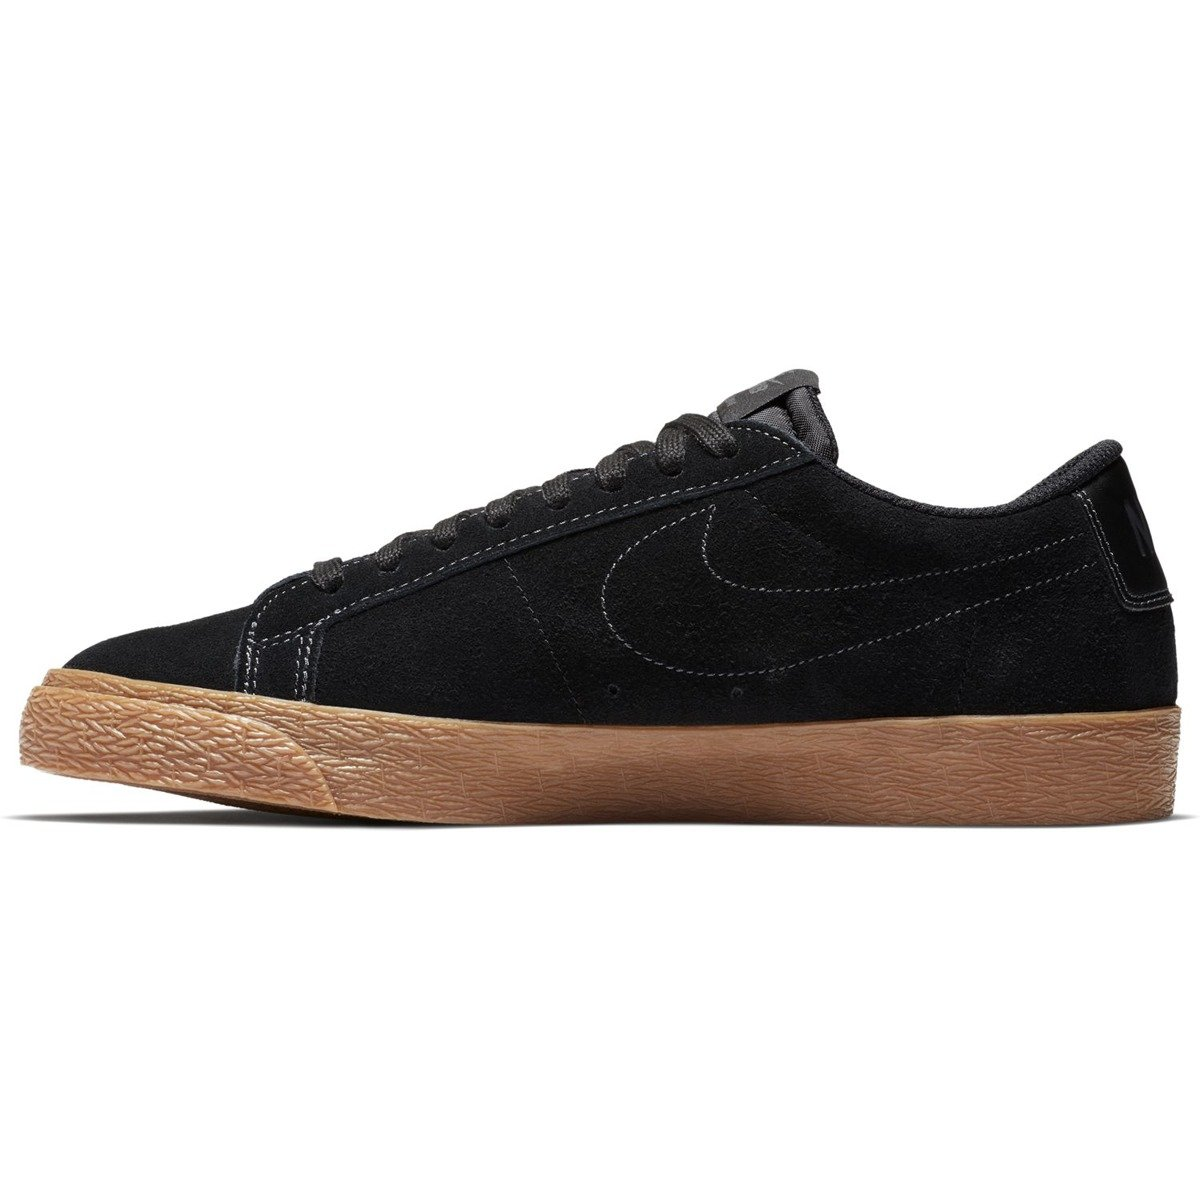 424f8c01d7296 ... shoes nike sb zoom blazer low black/black-anthracite Click to zoom ...